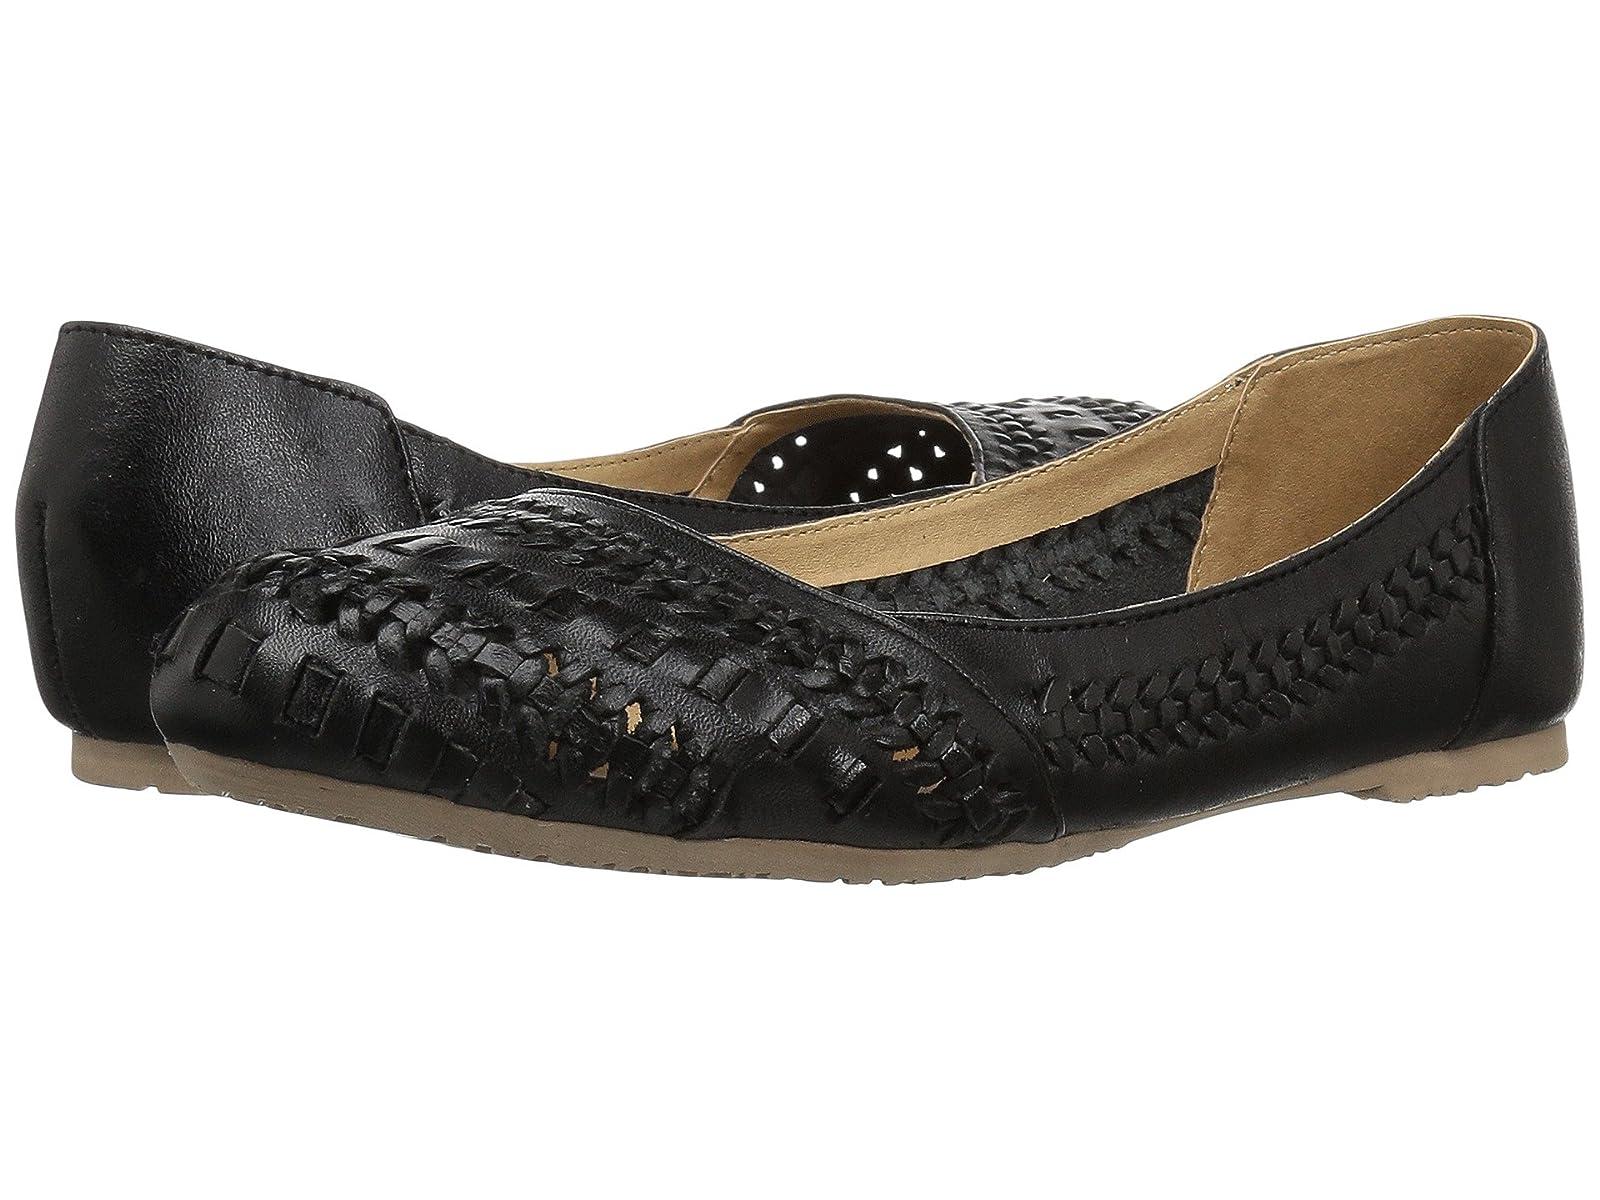 Sbicca CamiAtmospheric grades have affordable shoes